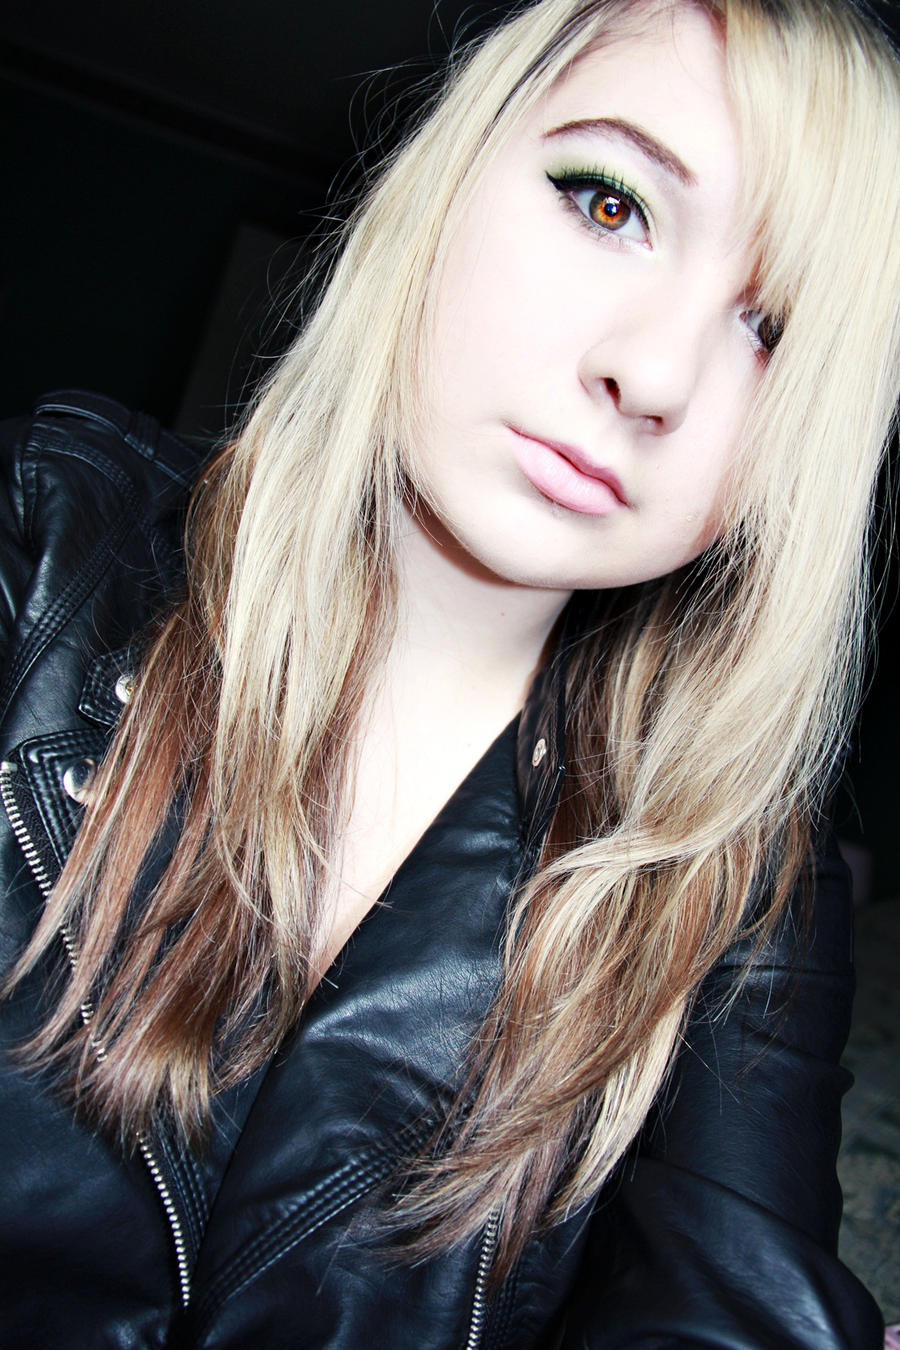 MinjiBby's Profile Picture